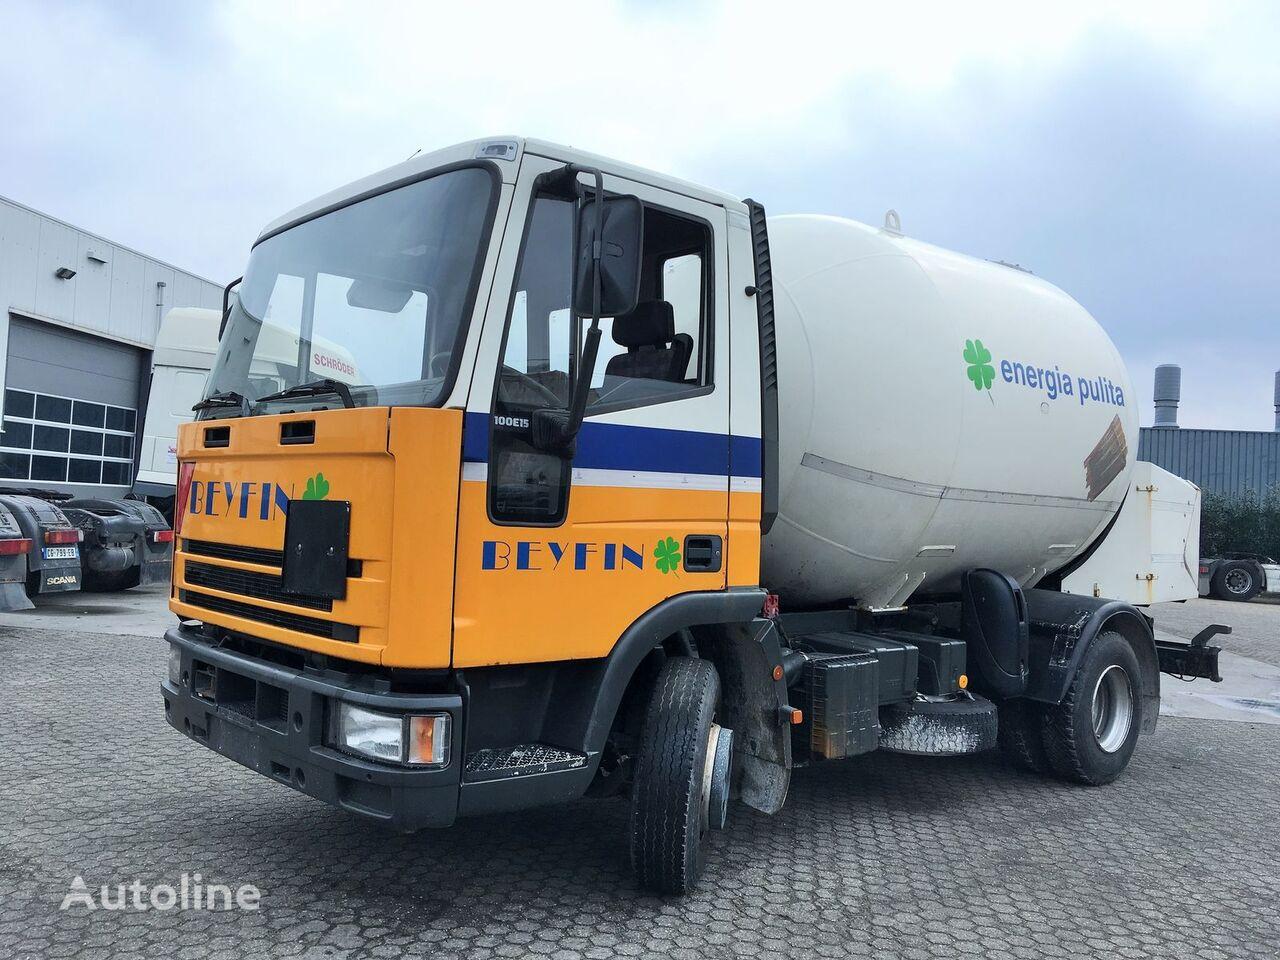 IVECO Iveco Gas - Gaz - ADR 2 - 10.000ltr - 27Bar - P27BH Gastransporter LKW